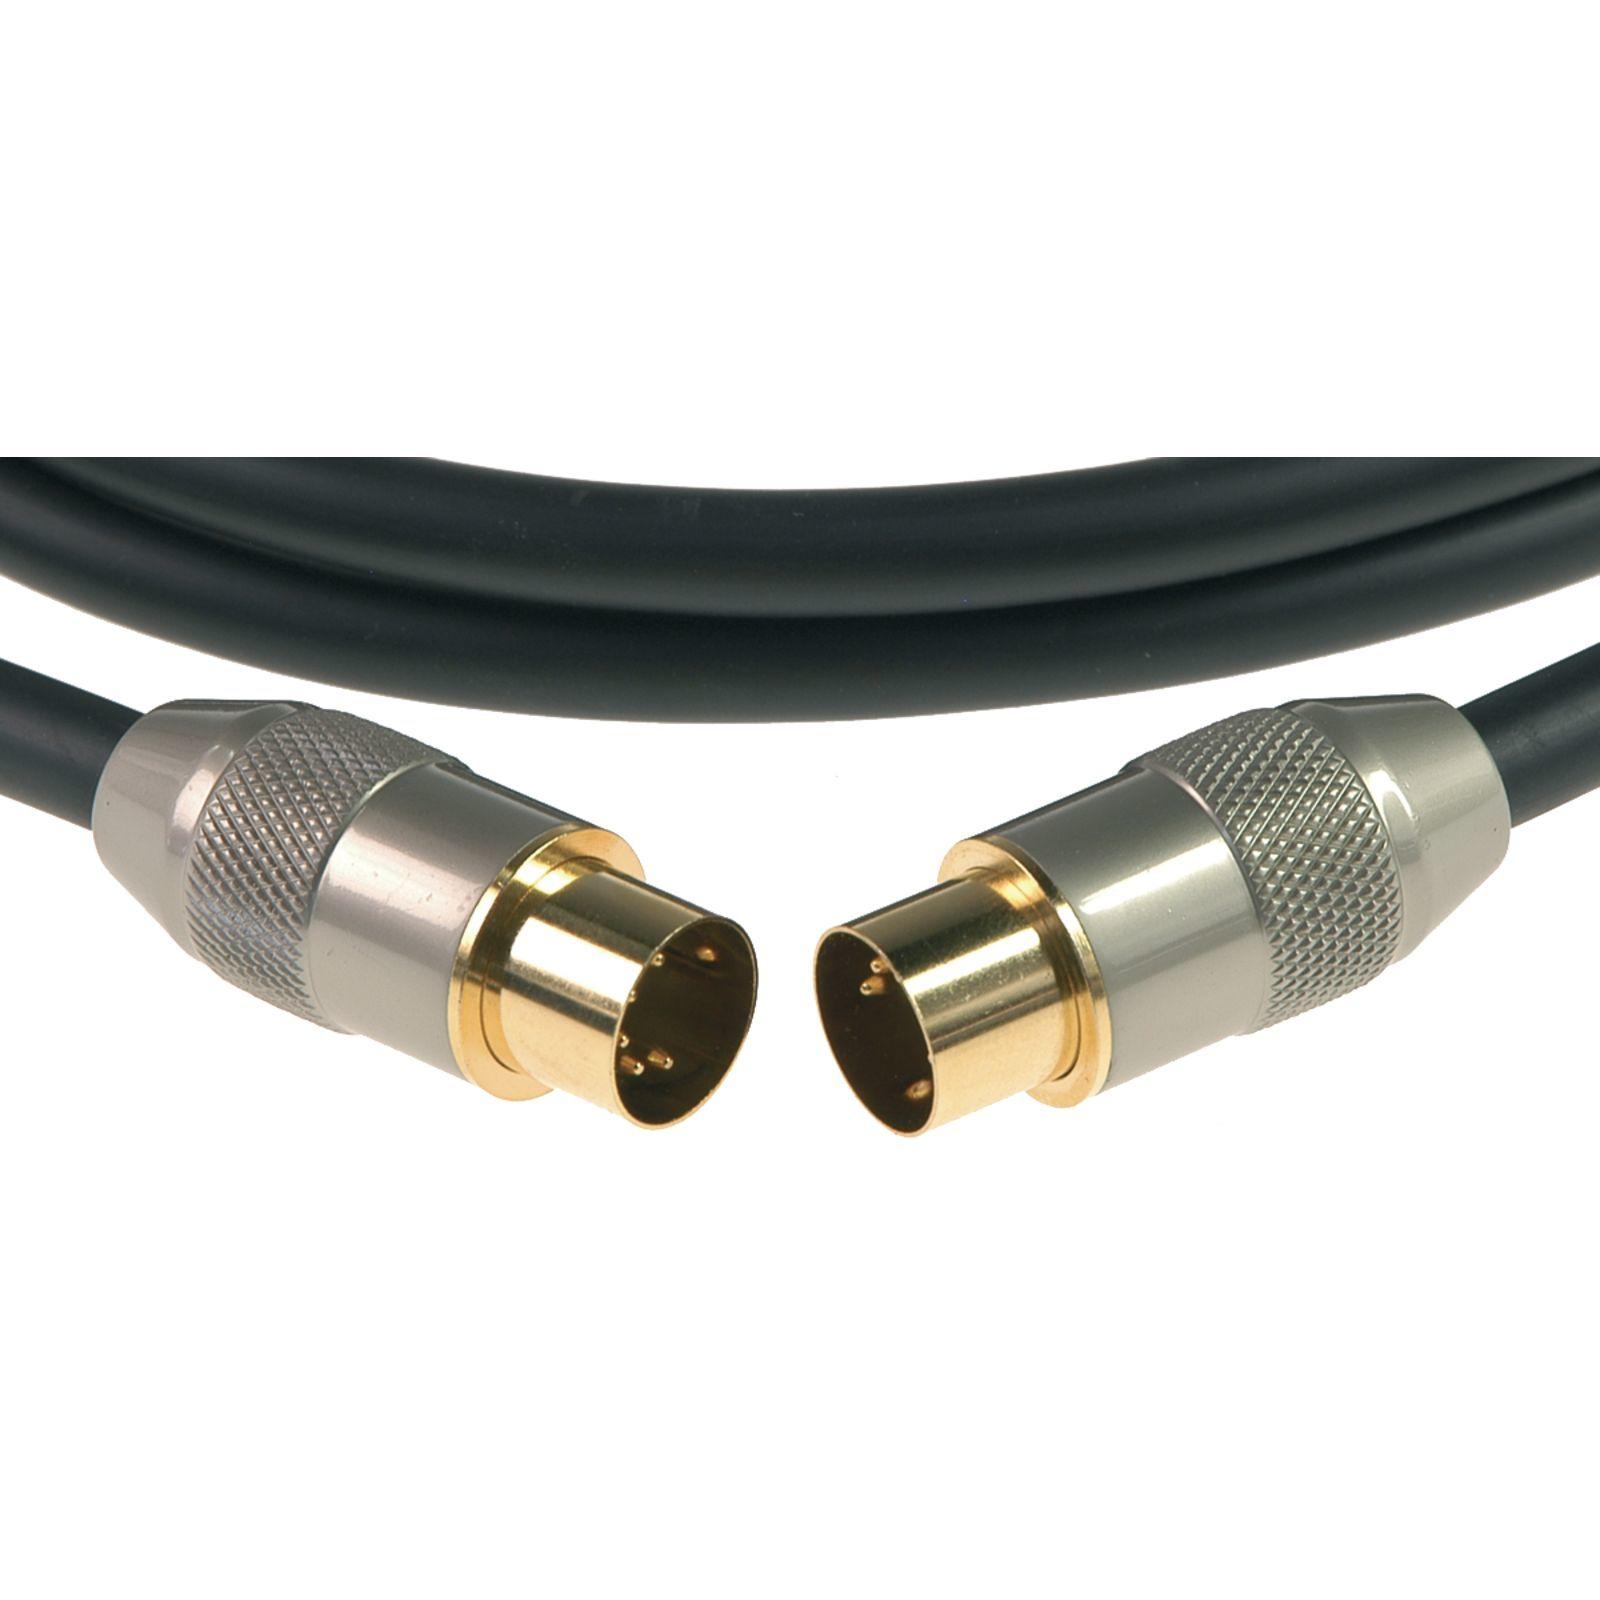 Midi Cable 1,8m MIDM-018